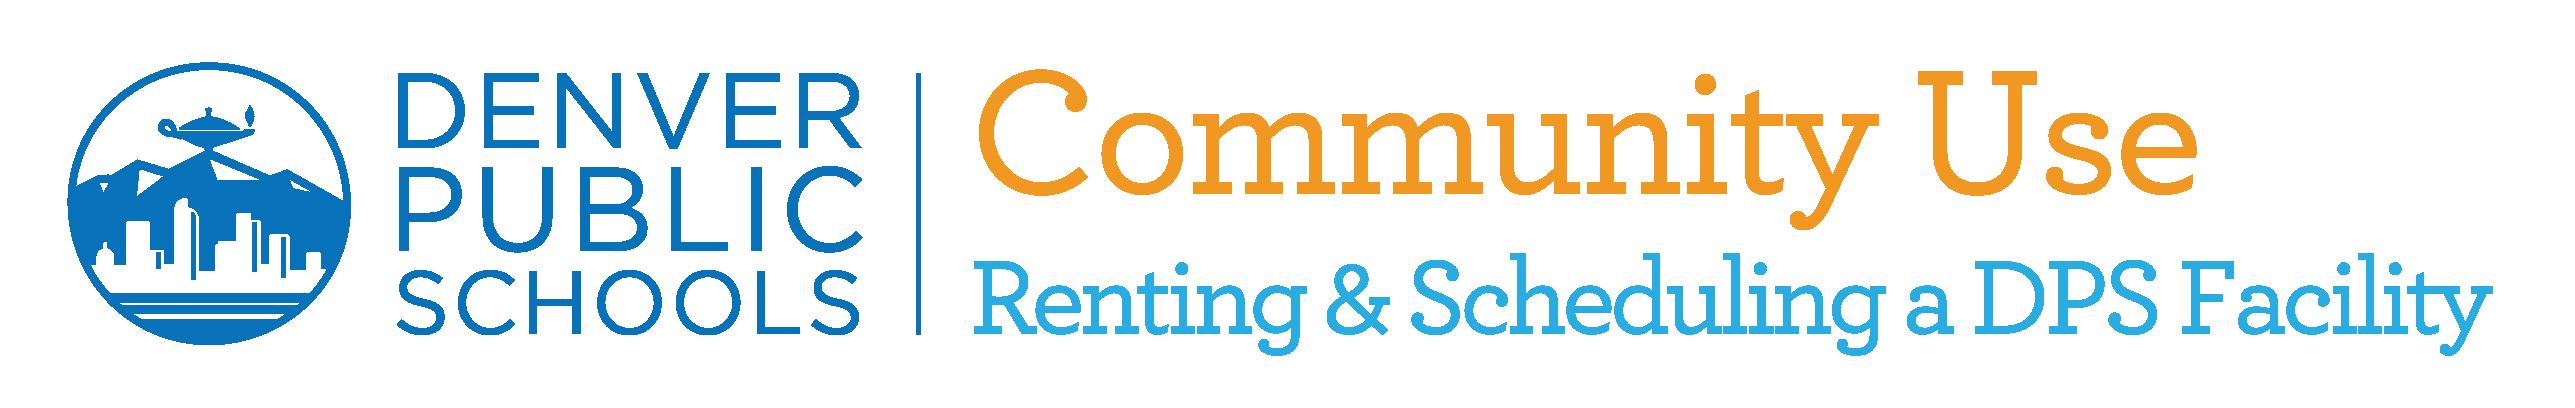 dps_departmentlogo_communityuse